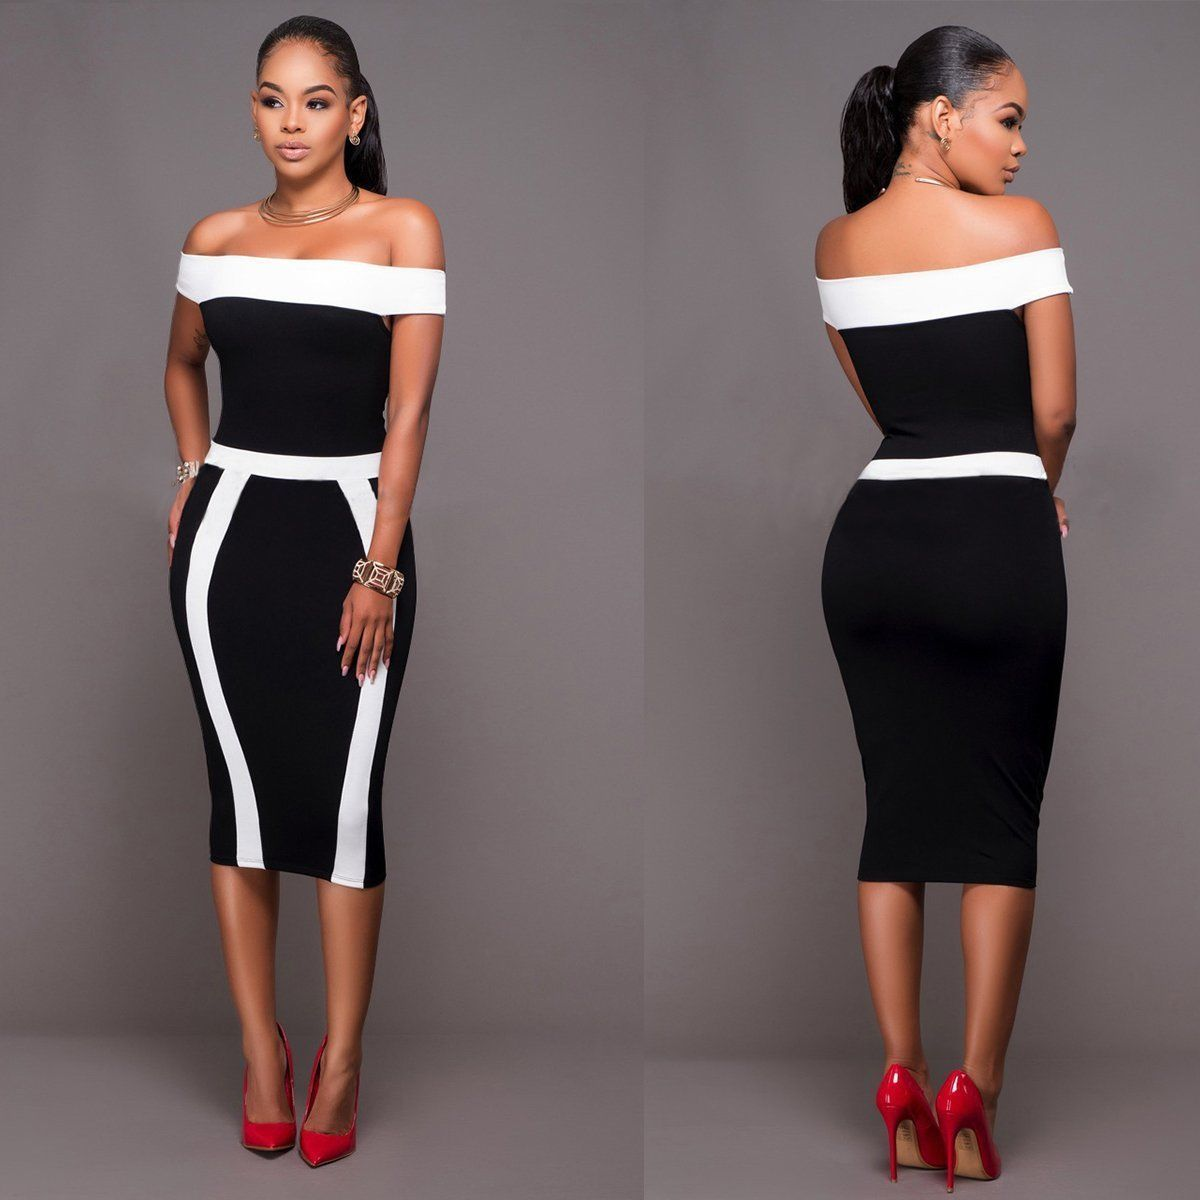 Black Girl Clothing: Womens Bodycon Black Slash Neck Off Shoulder Dress Ladies